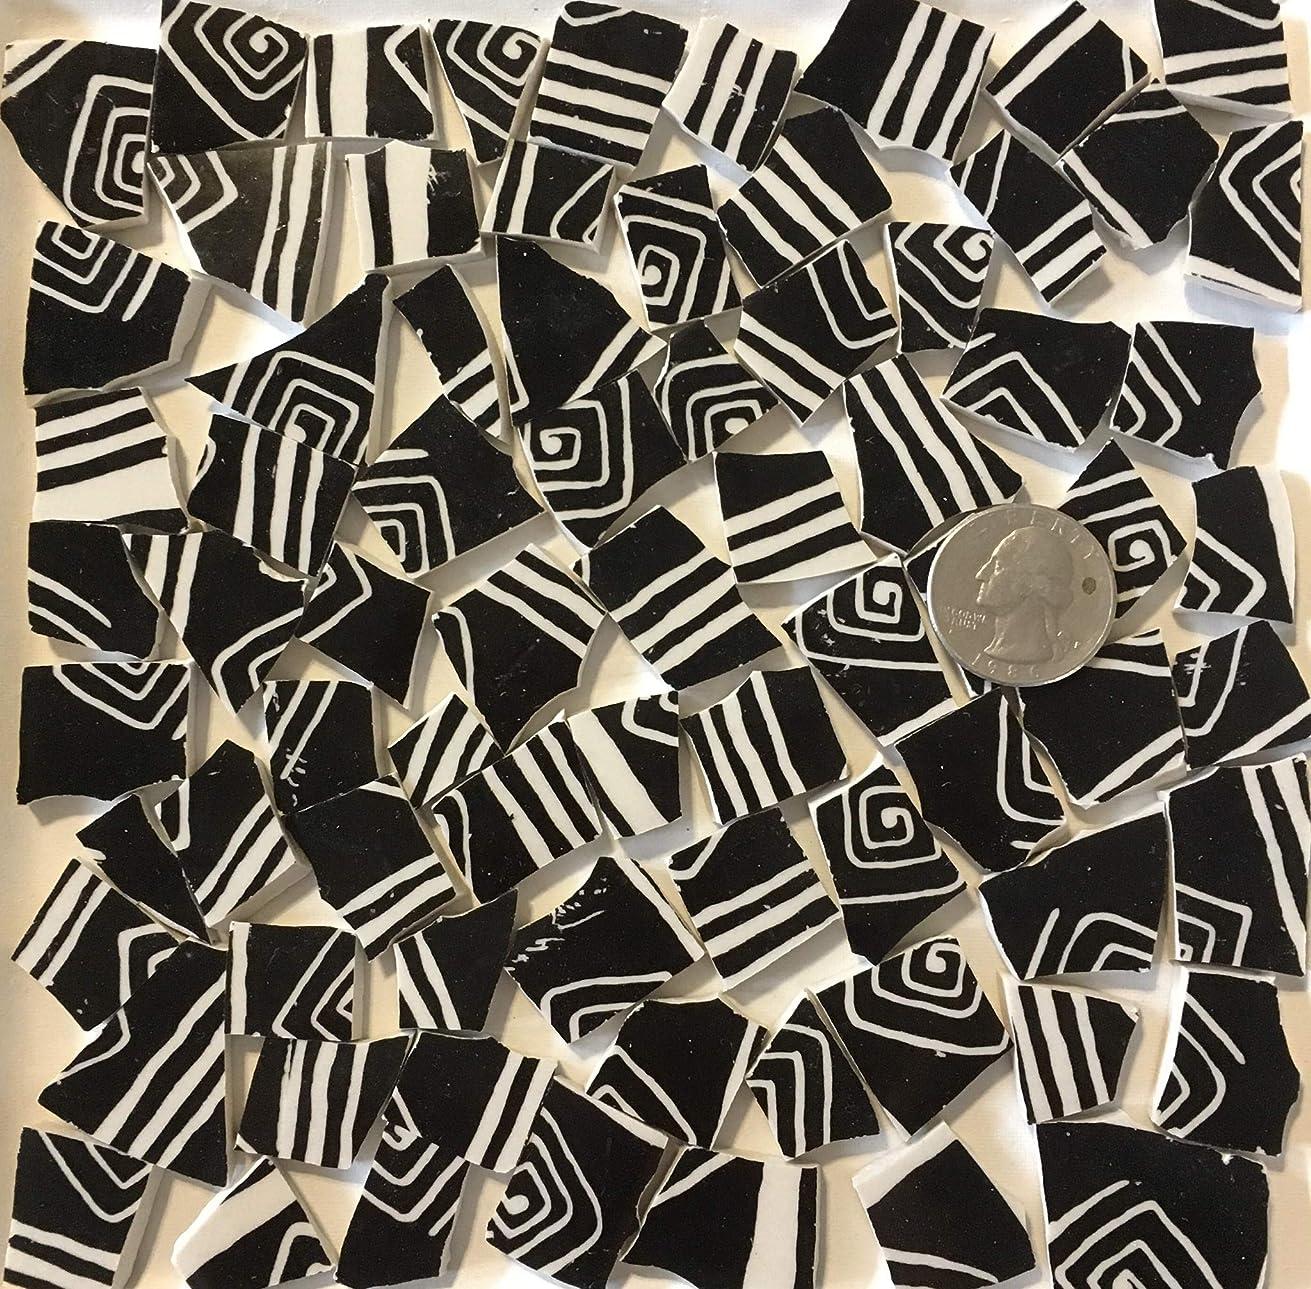 Mosaic Art & Craft Supply ~ Black & Cream Graphic Tiles (B159)